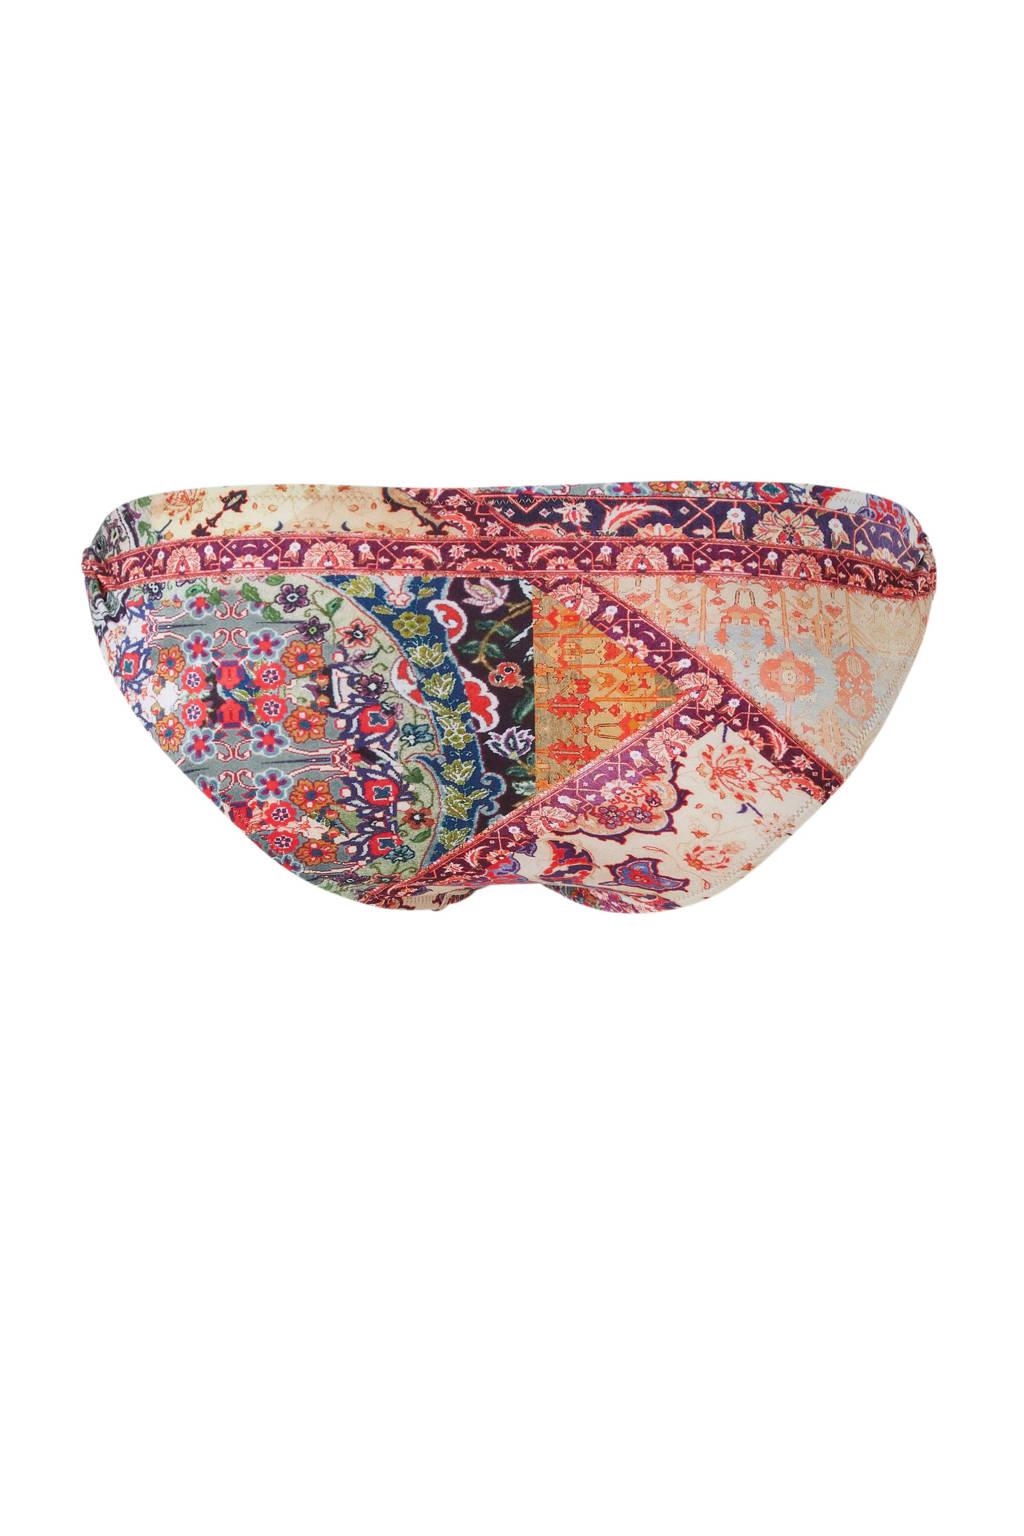 Bikini Print All Watercultstrik Over In Broekje nf0URwx4q